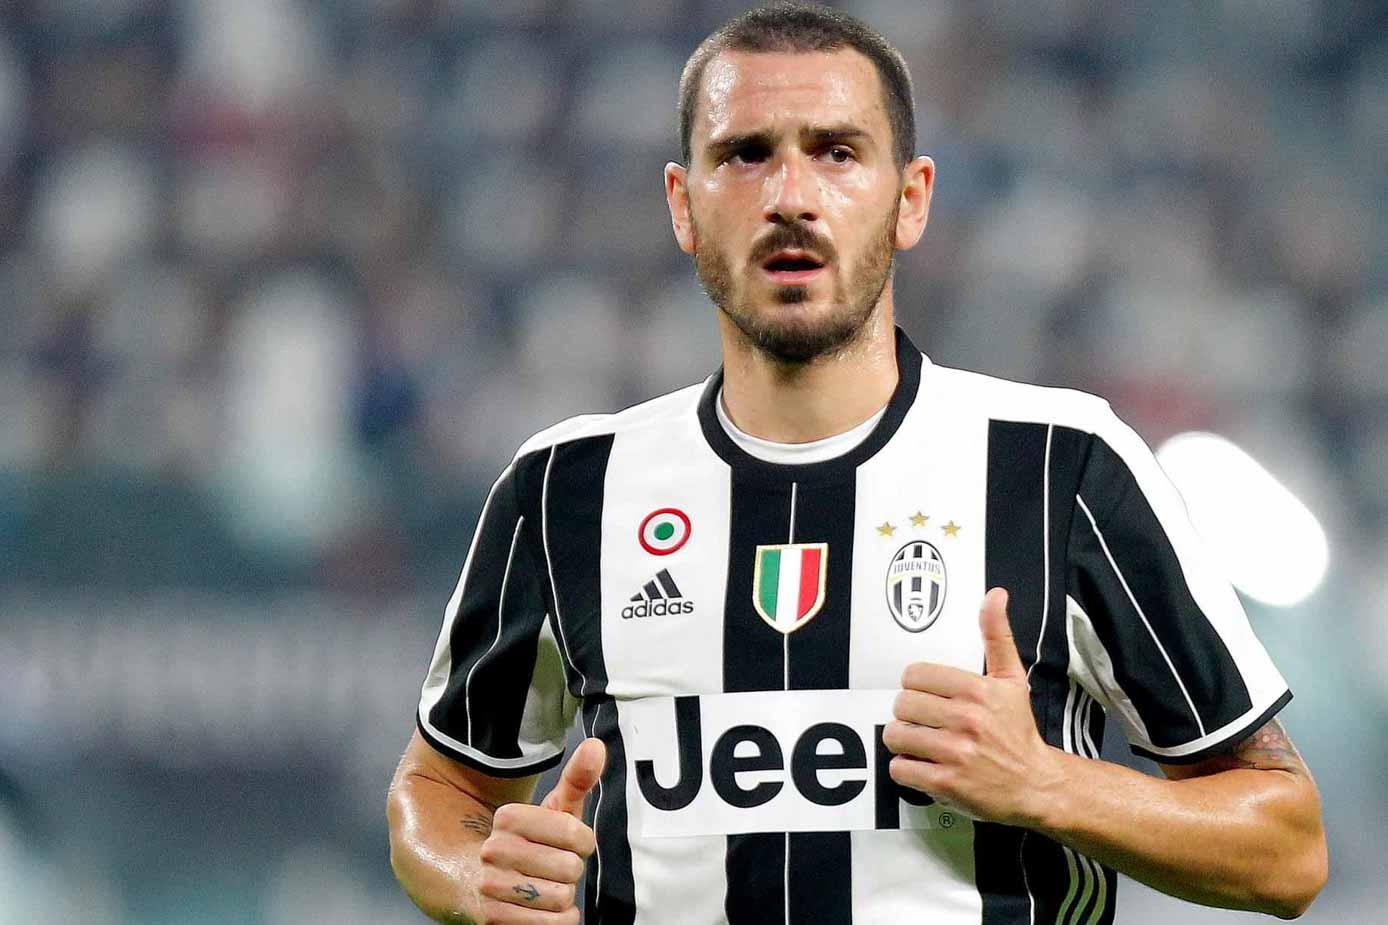 Bonucci Jersey - Italy & Juventus - SoccerPro.com